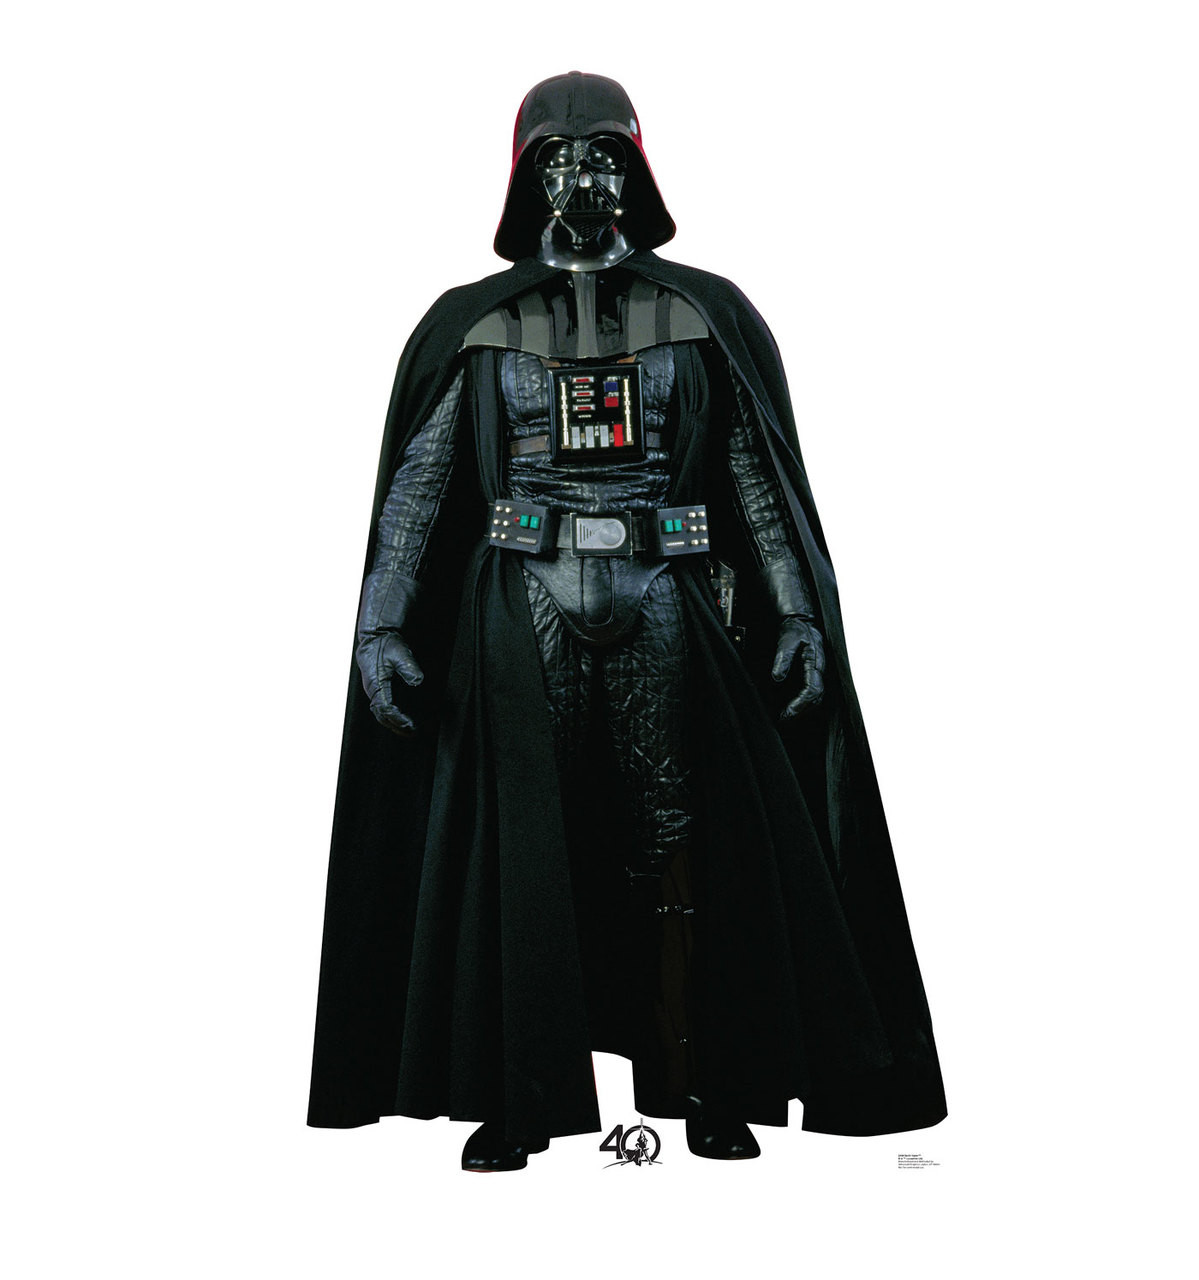 Darth Vader  - Star Wars 40th - Cardboard Cutout 2464